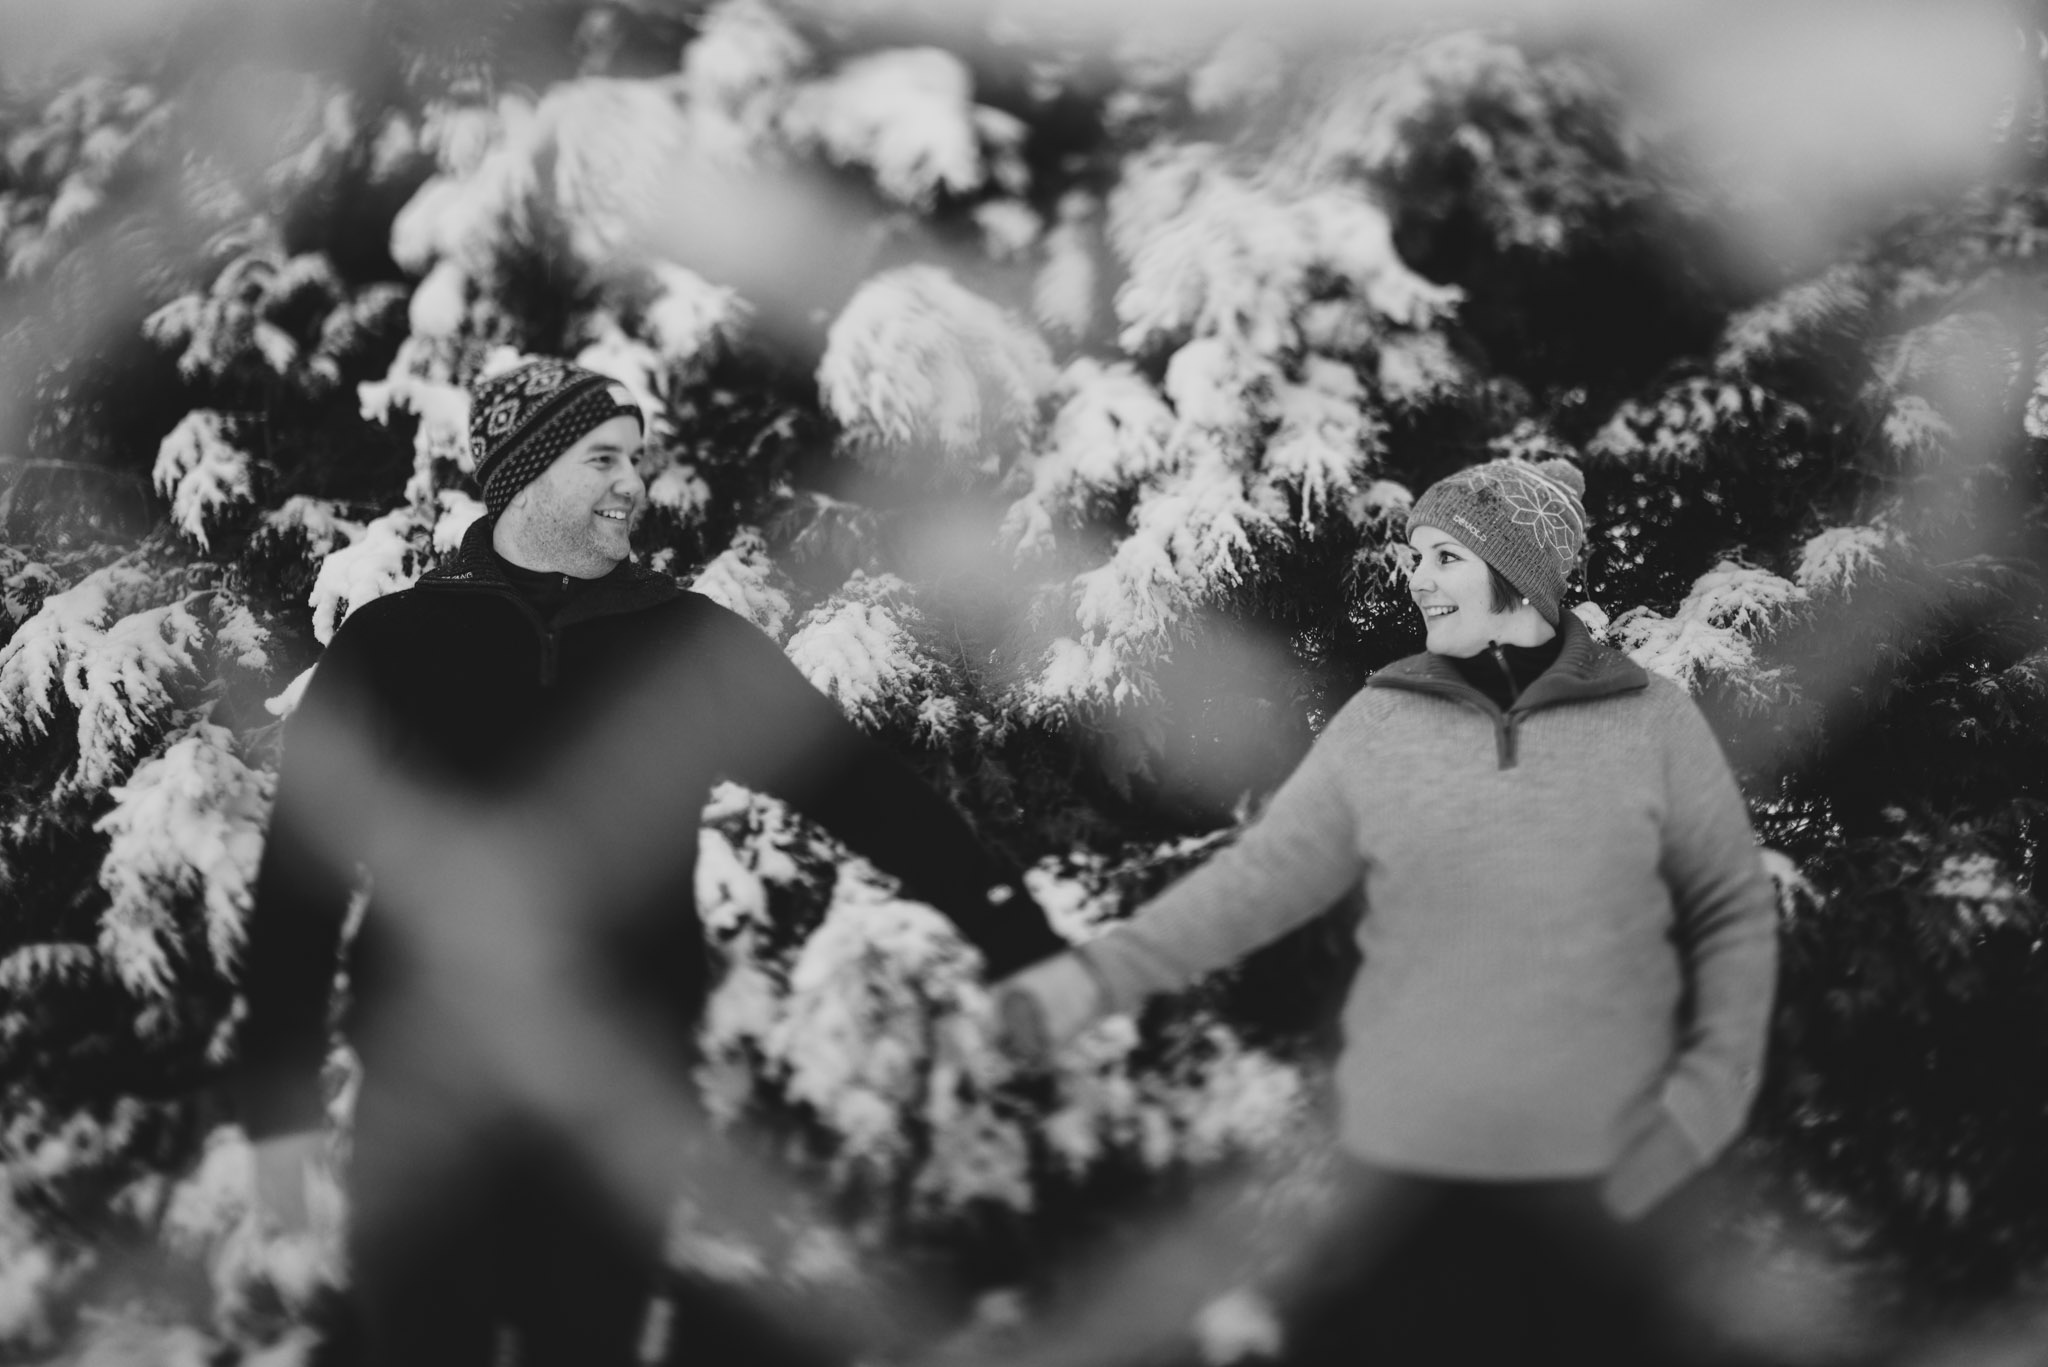 Bryllupsfotograf- stavanger-forlovet-vinterbilder-eirik-halvorsen-17.jpg